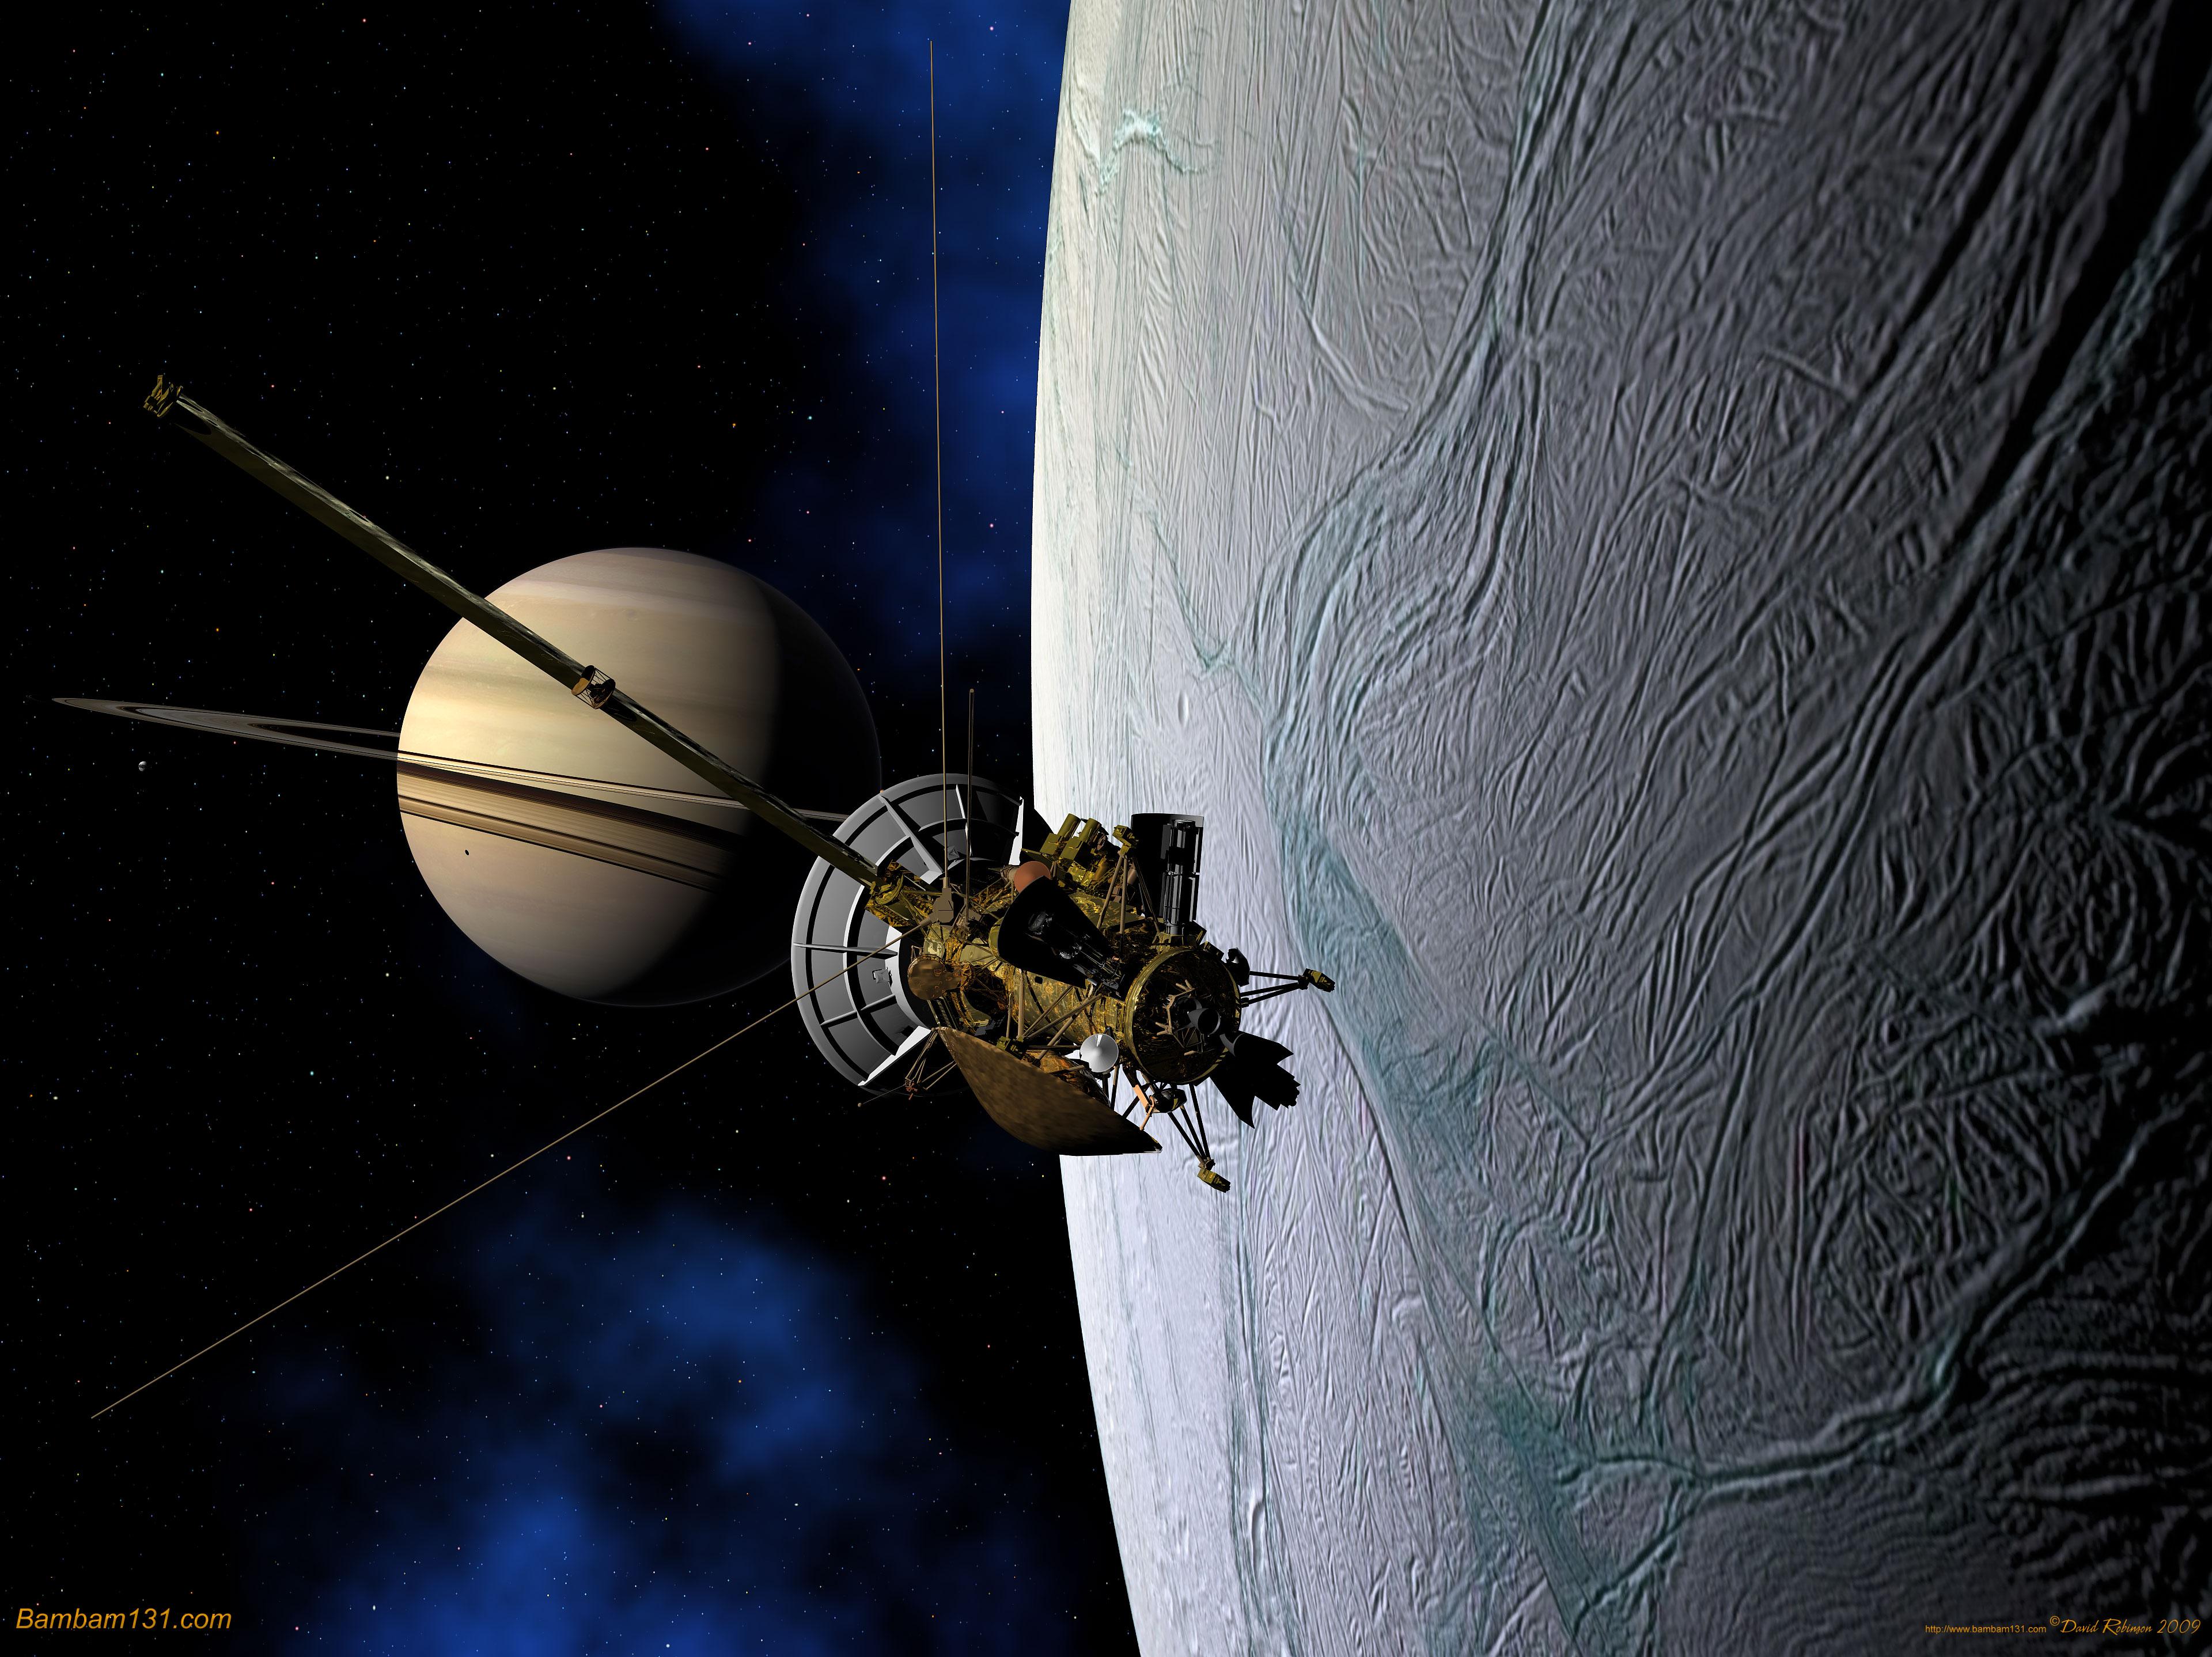 Encelado vista da vicino | MEDIA INAF